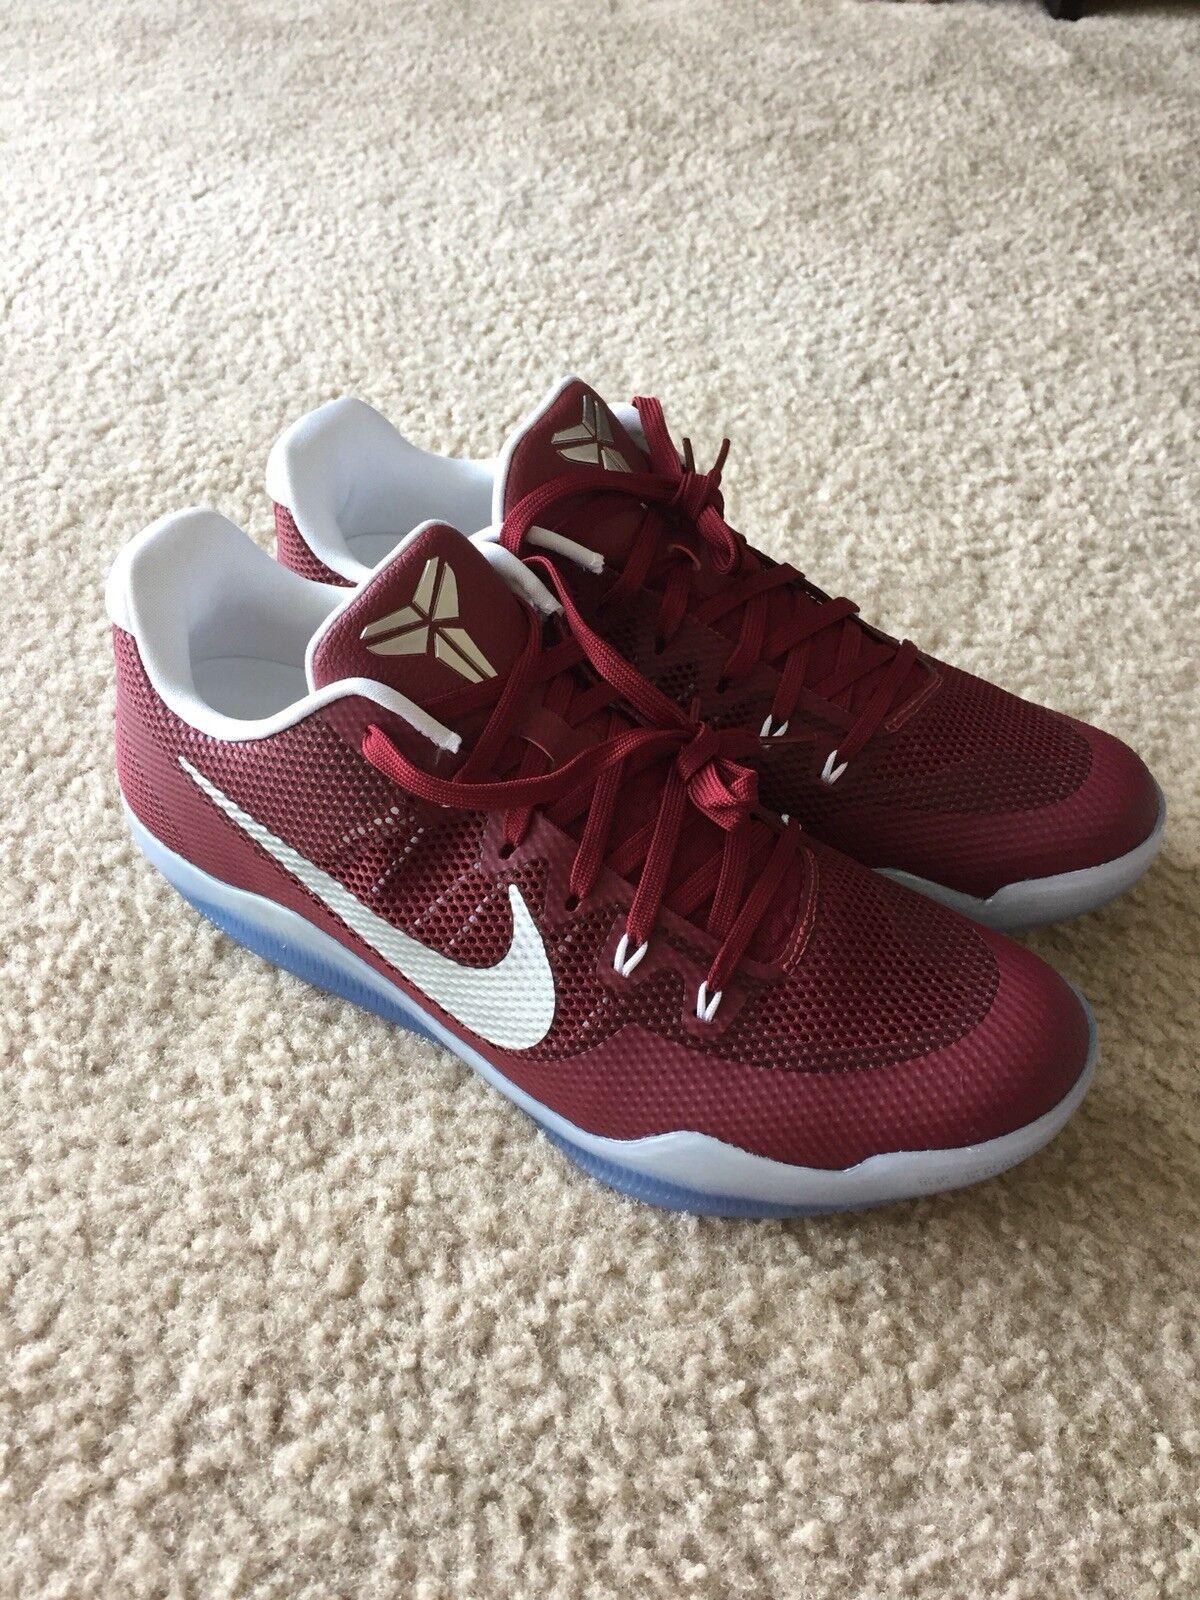 Nike Kobe XI TB Promo Team Red Maroon 856485 662 Men's Size 13.5 NoBoxLid